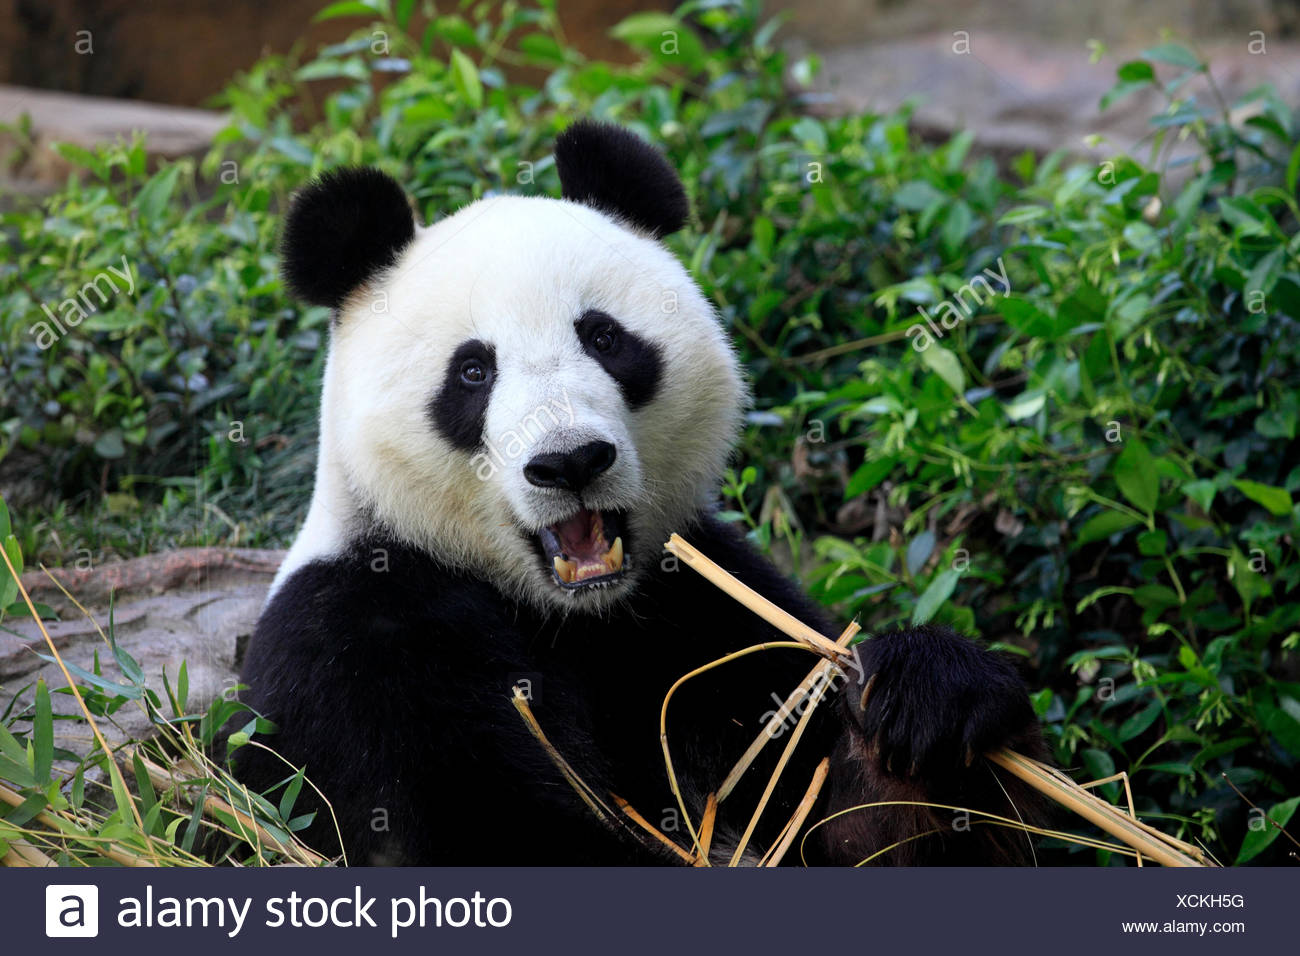 El panda gigante, Ailuropoda melanoleuca / (Asia) Imagen De Stock